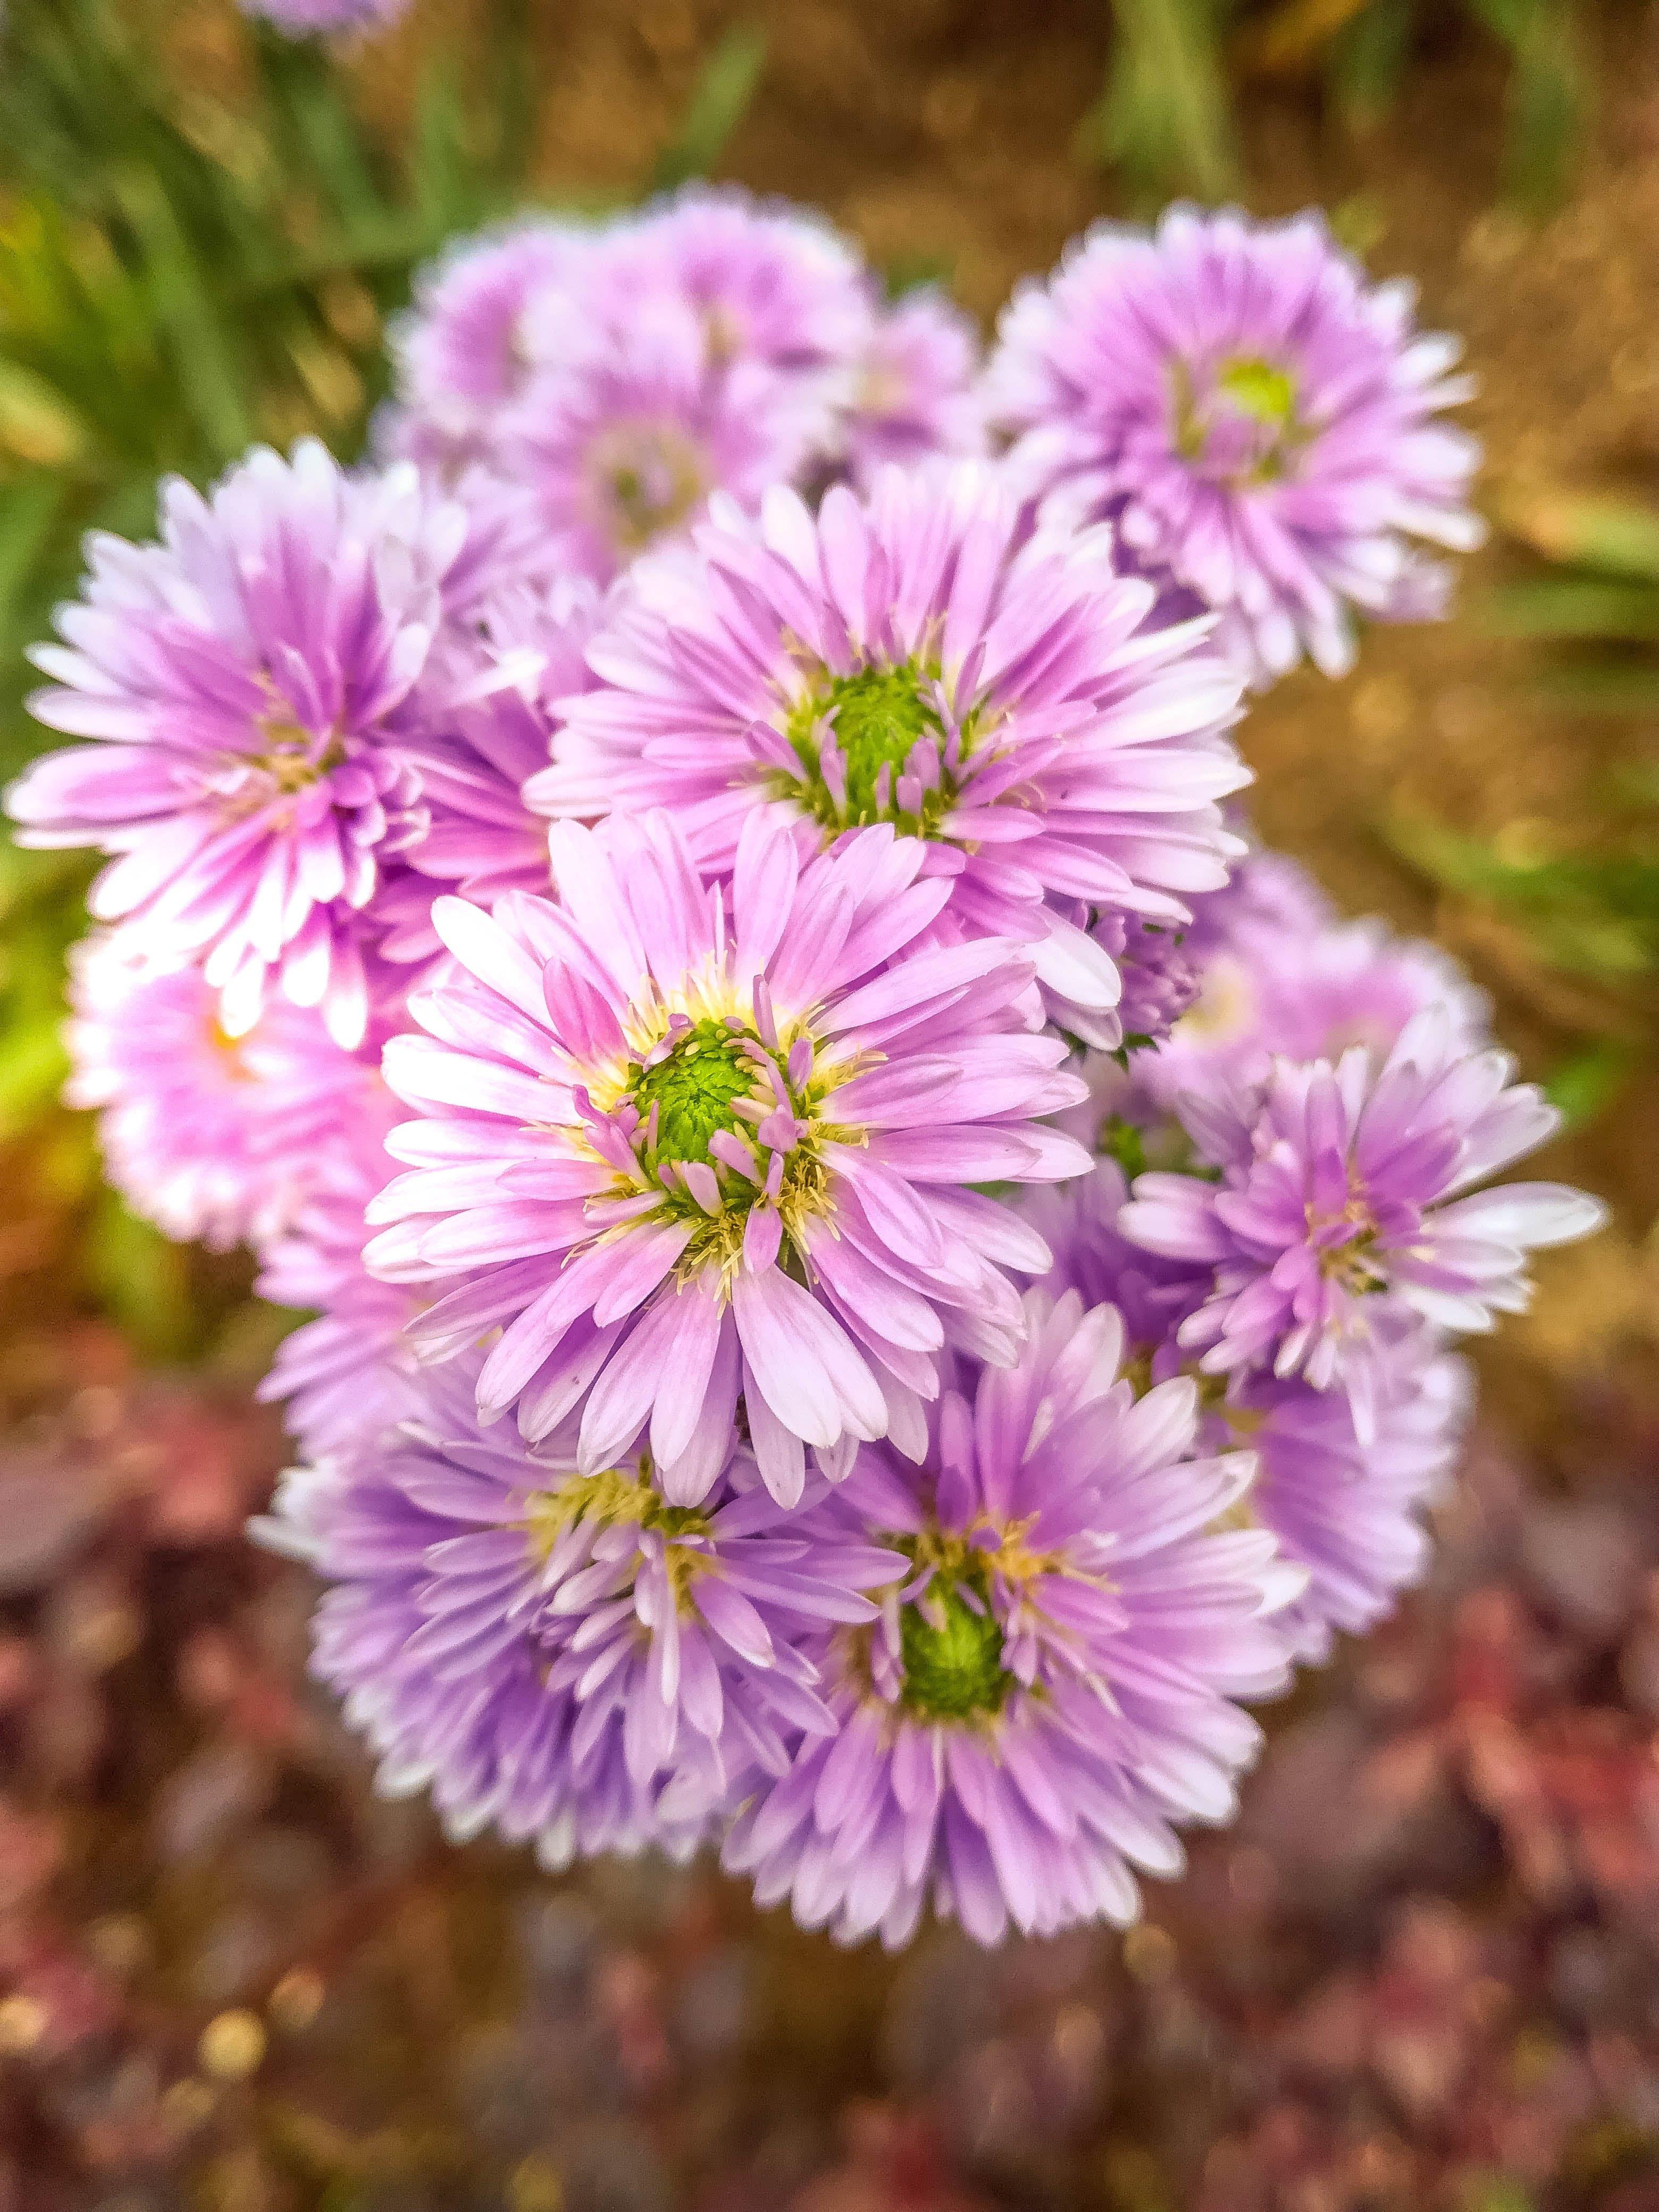 Purple Asters Closeup Photo at Daytime